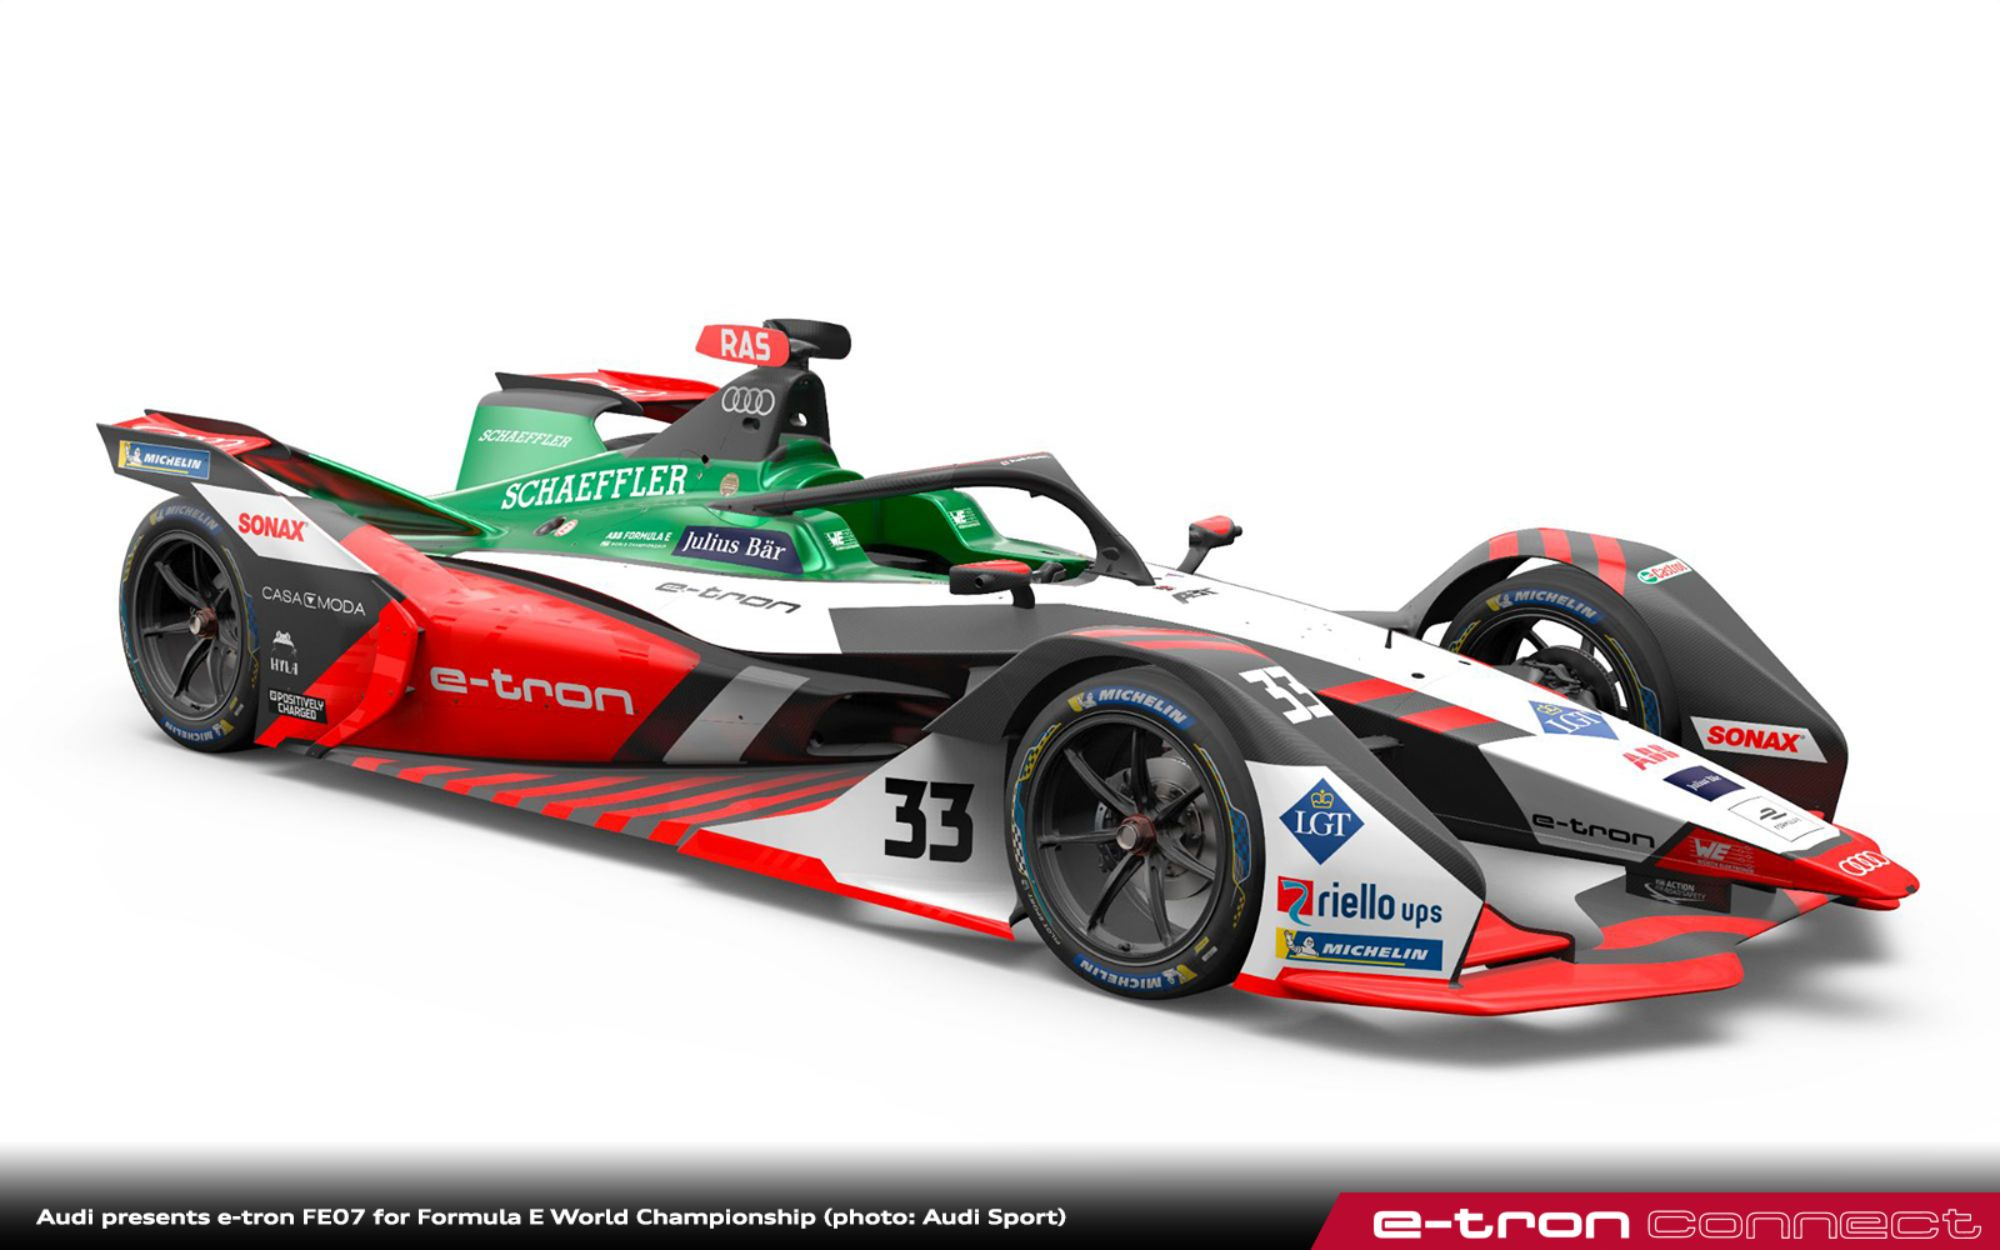 Audi presents e-tron FE07 for Formula E World Championship